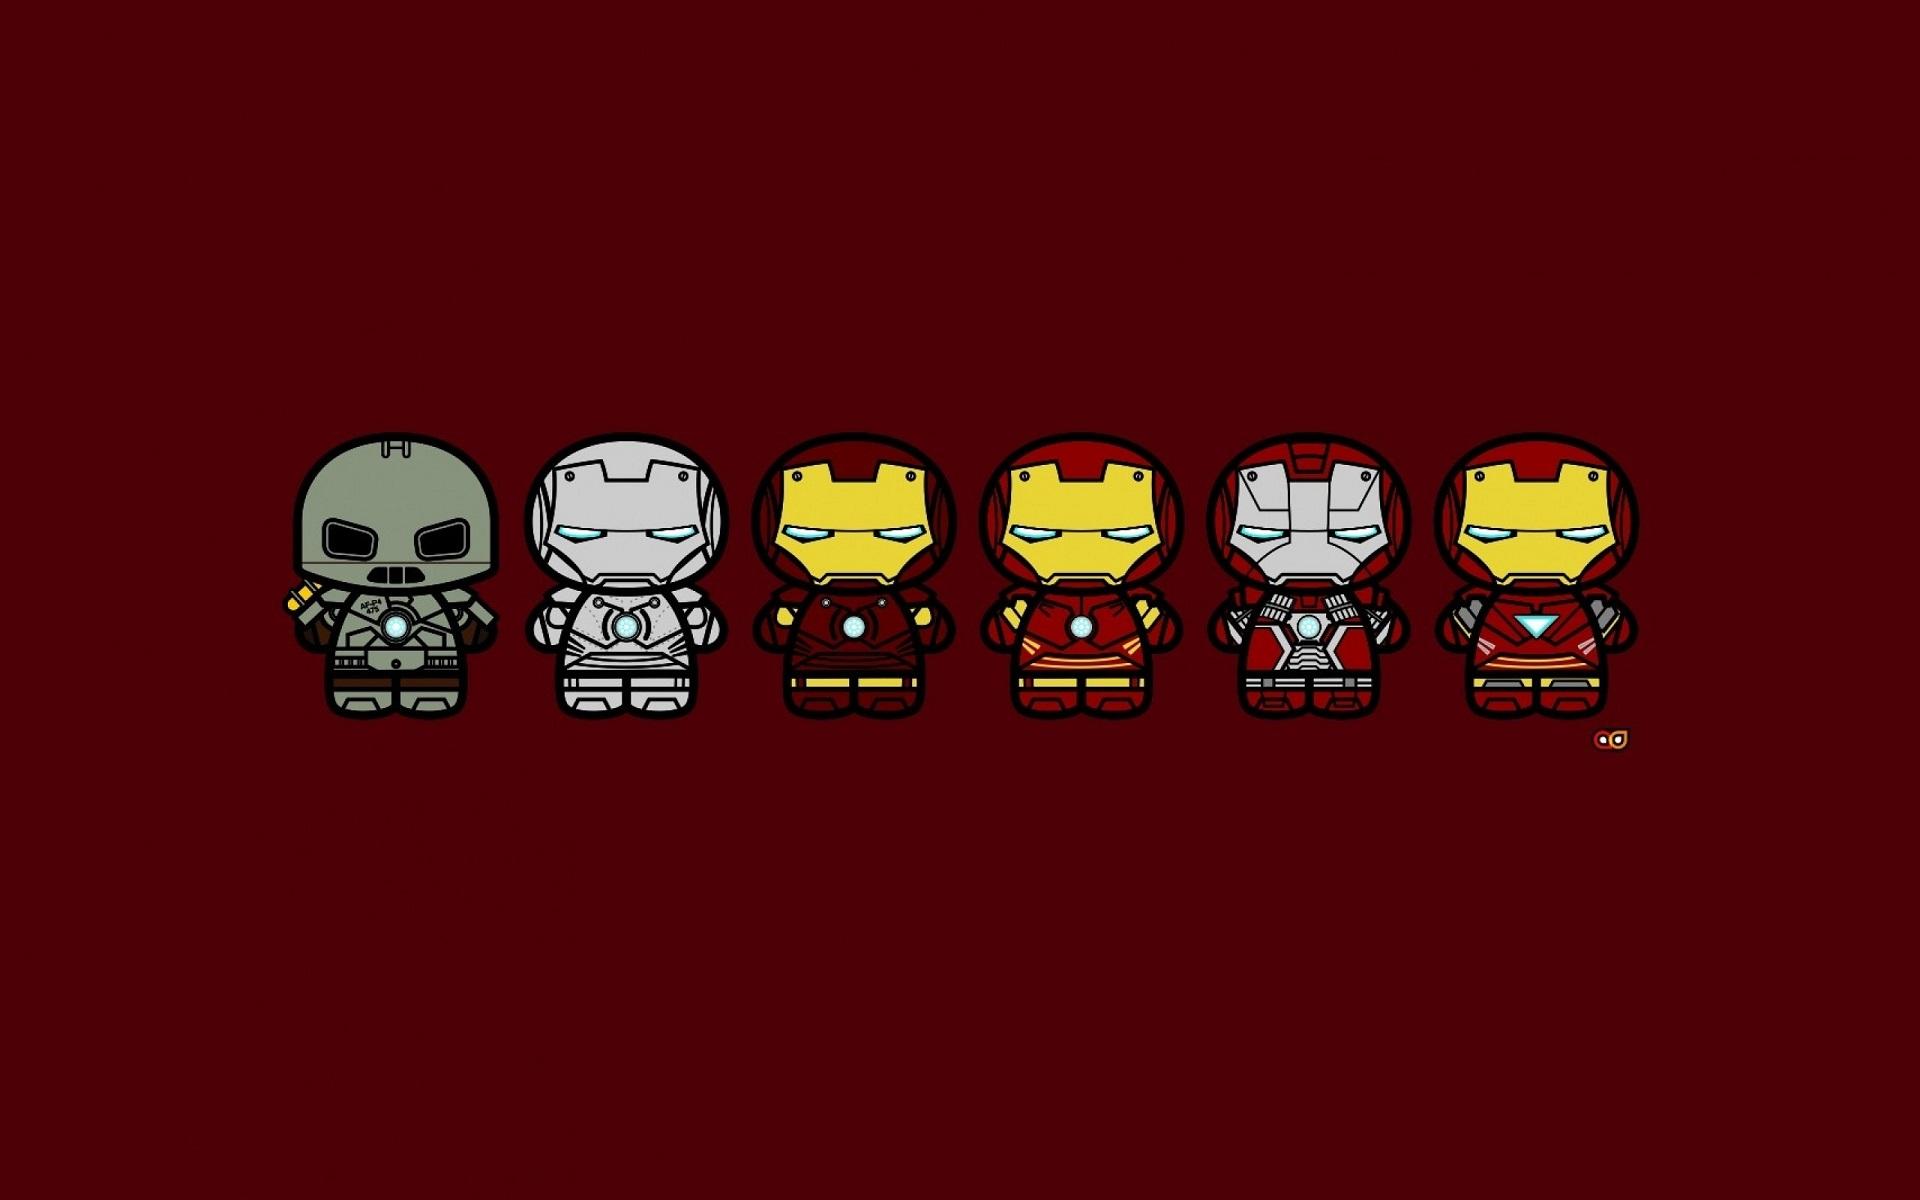 General 1920x1200 Iron Man superhero minimalism red Marvel Cinematic Universe Marvel Comics